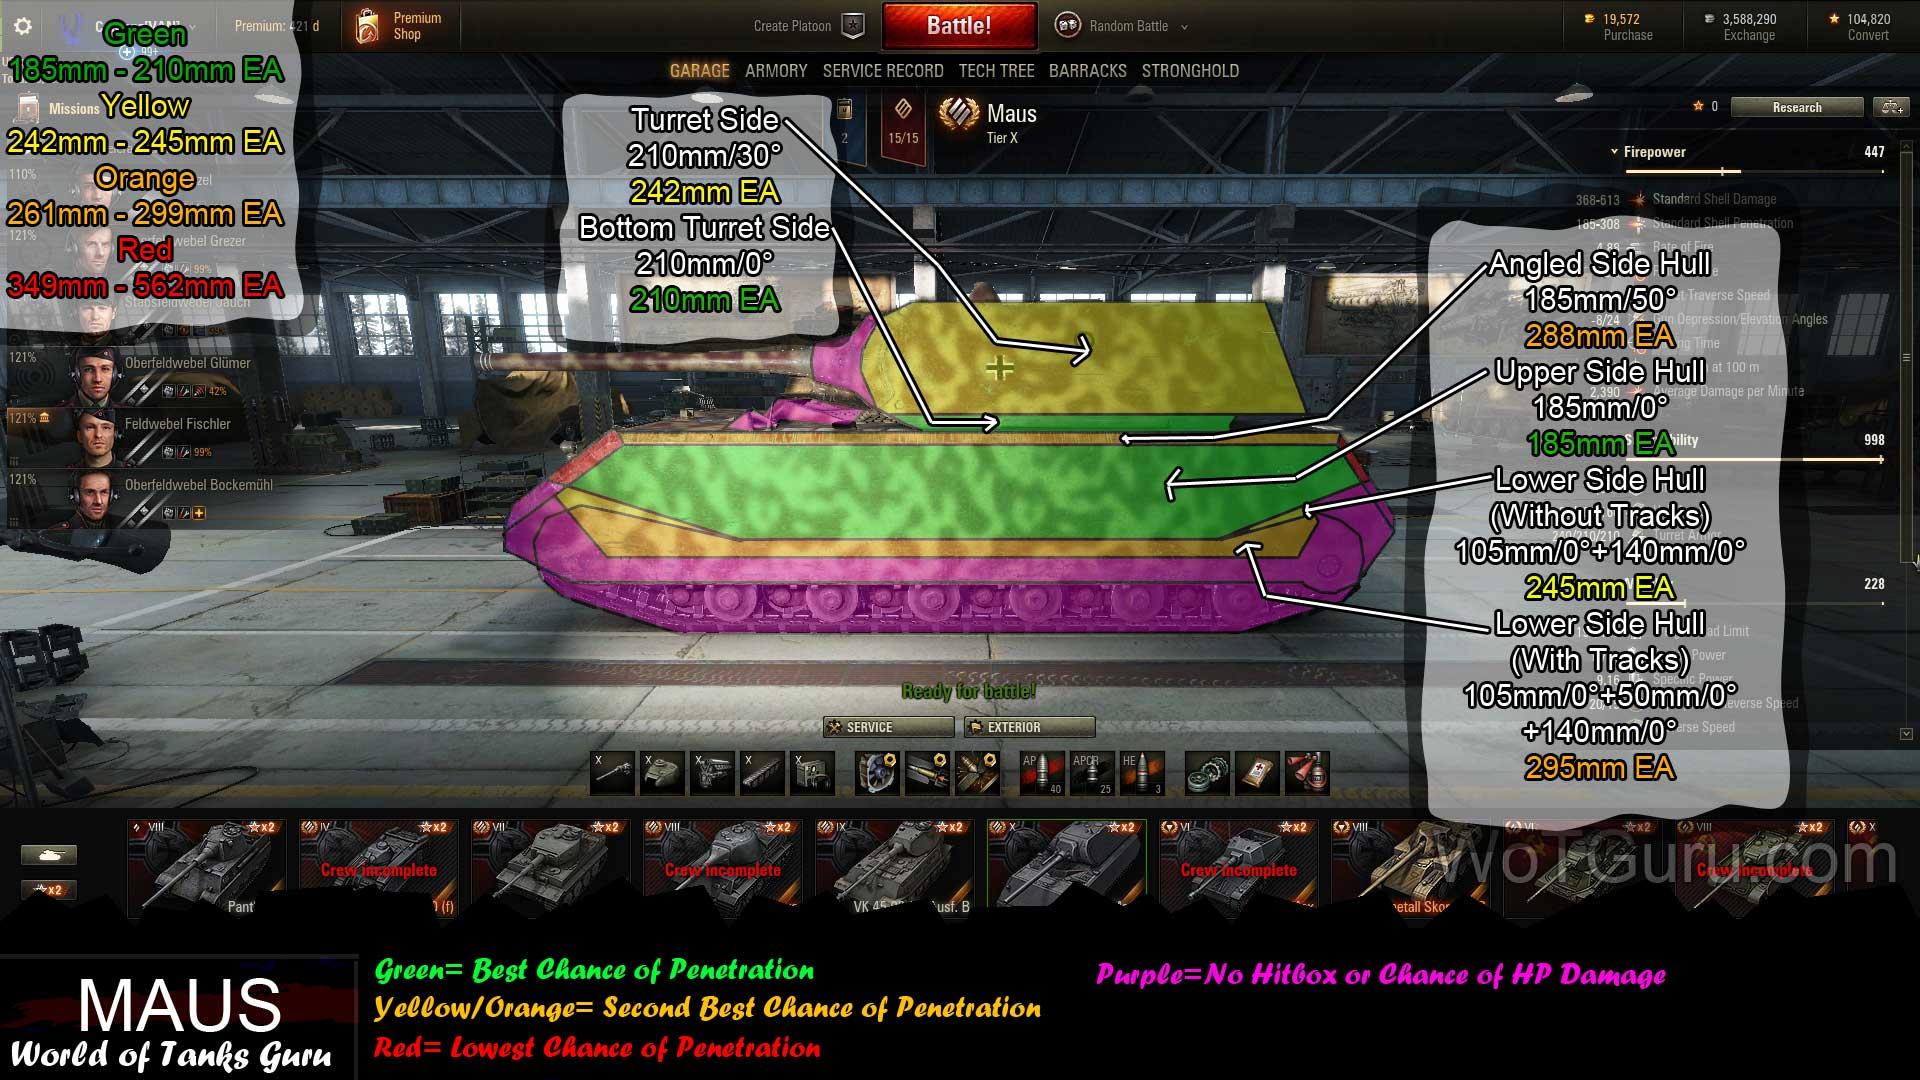 world of tanks blitz forum cz